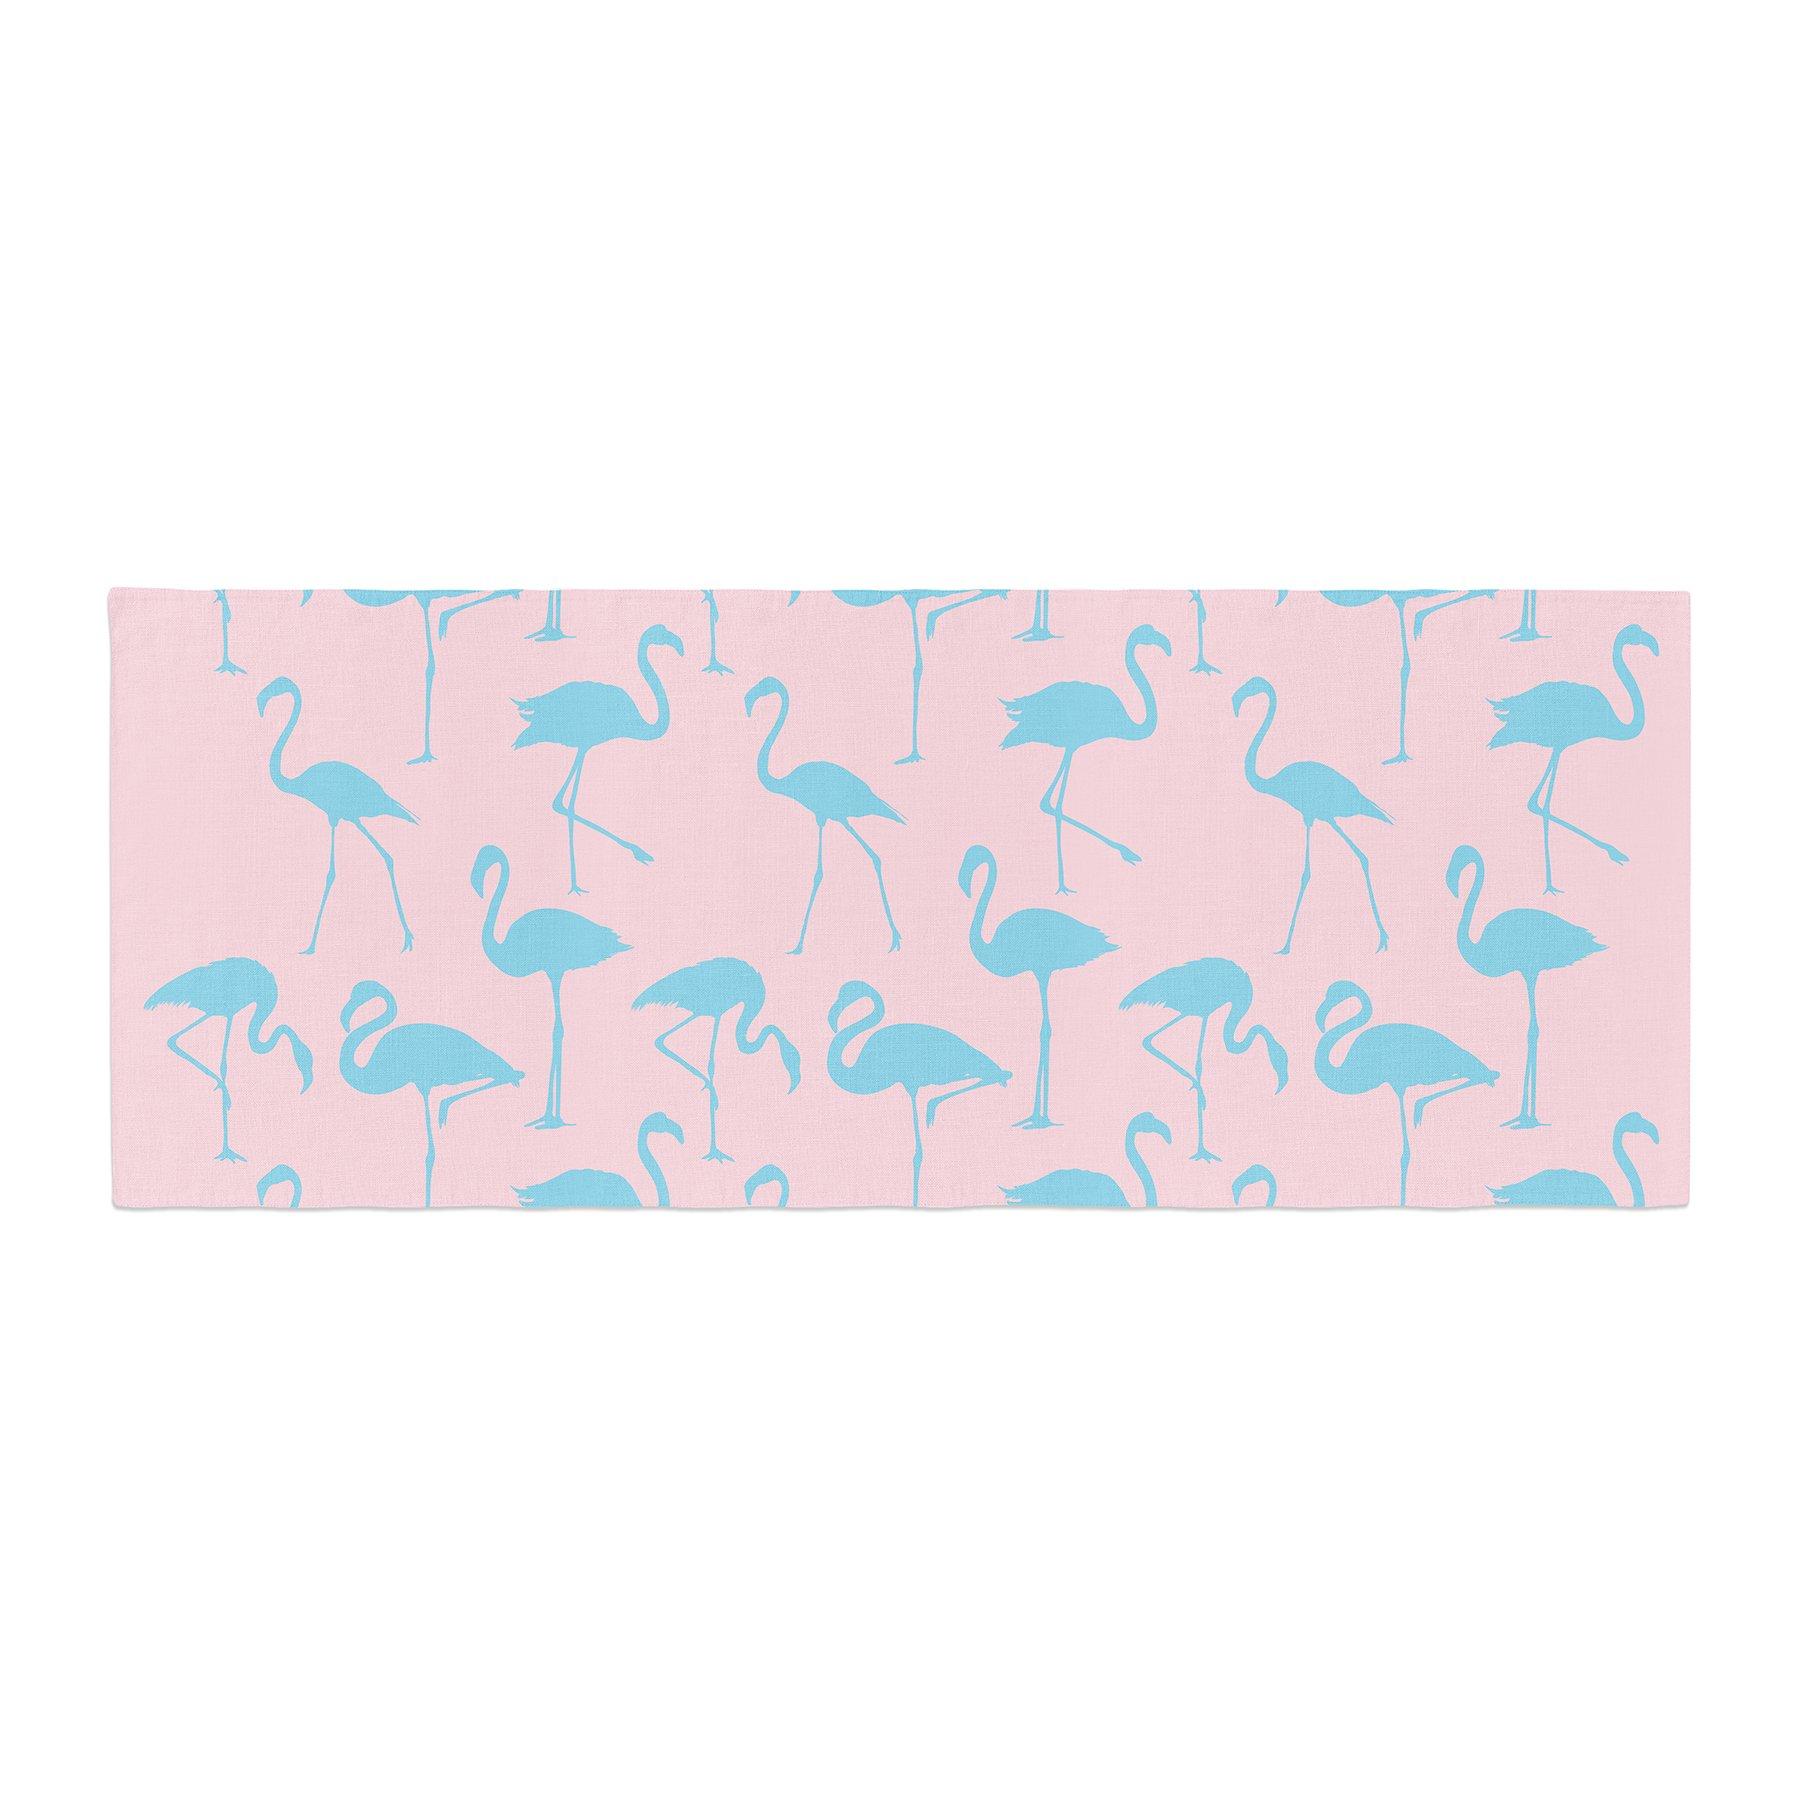 Kess InHouse Kess Original Blue On Pink Blue Animals Bed Runner, 34'' x 86''